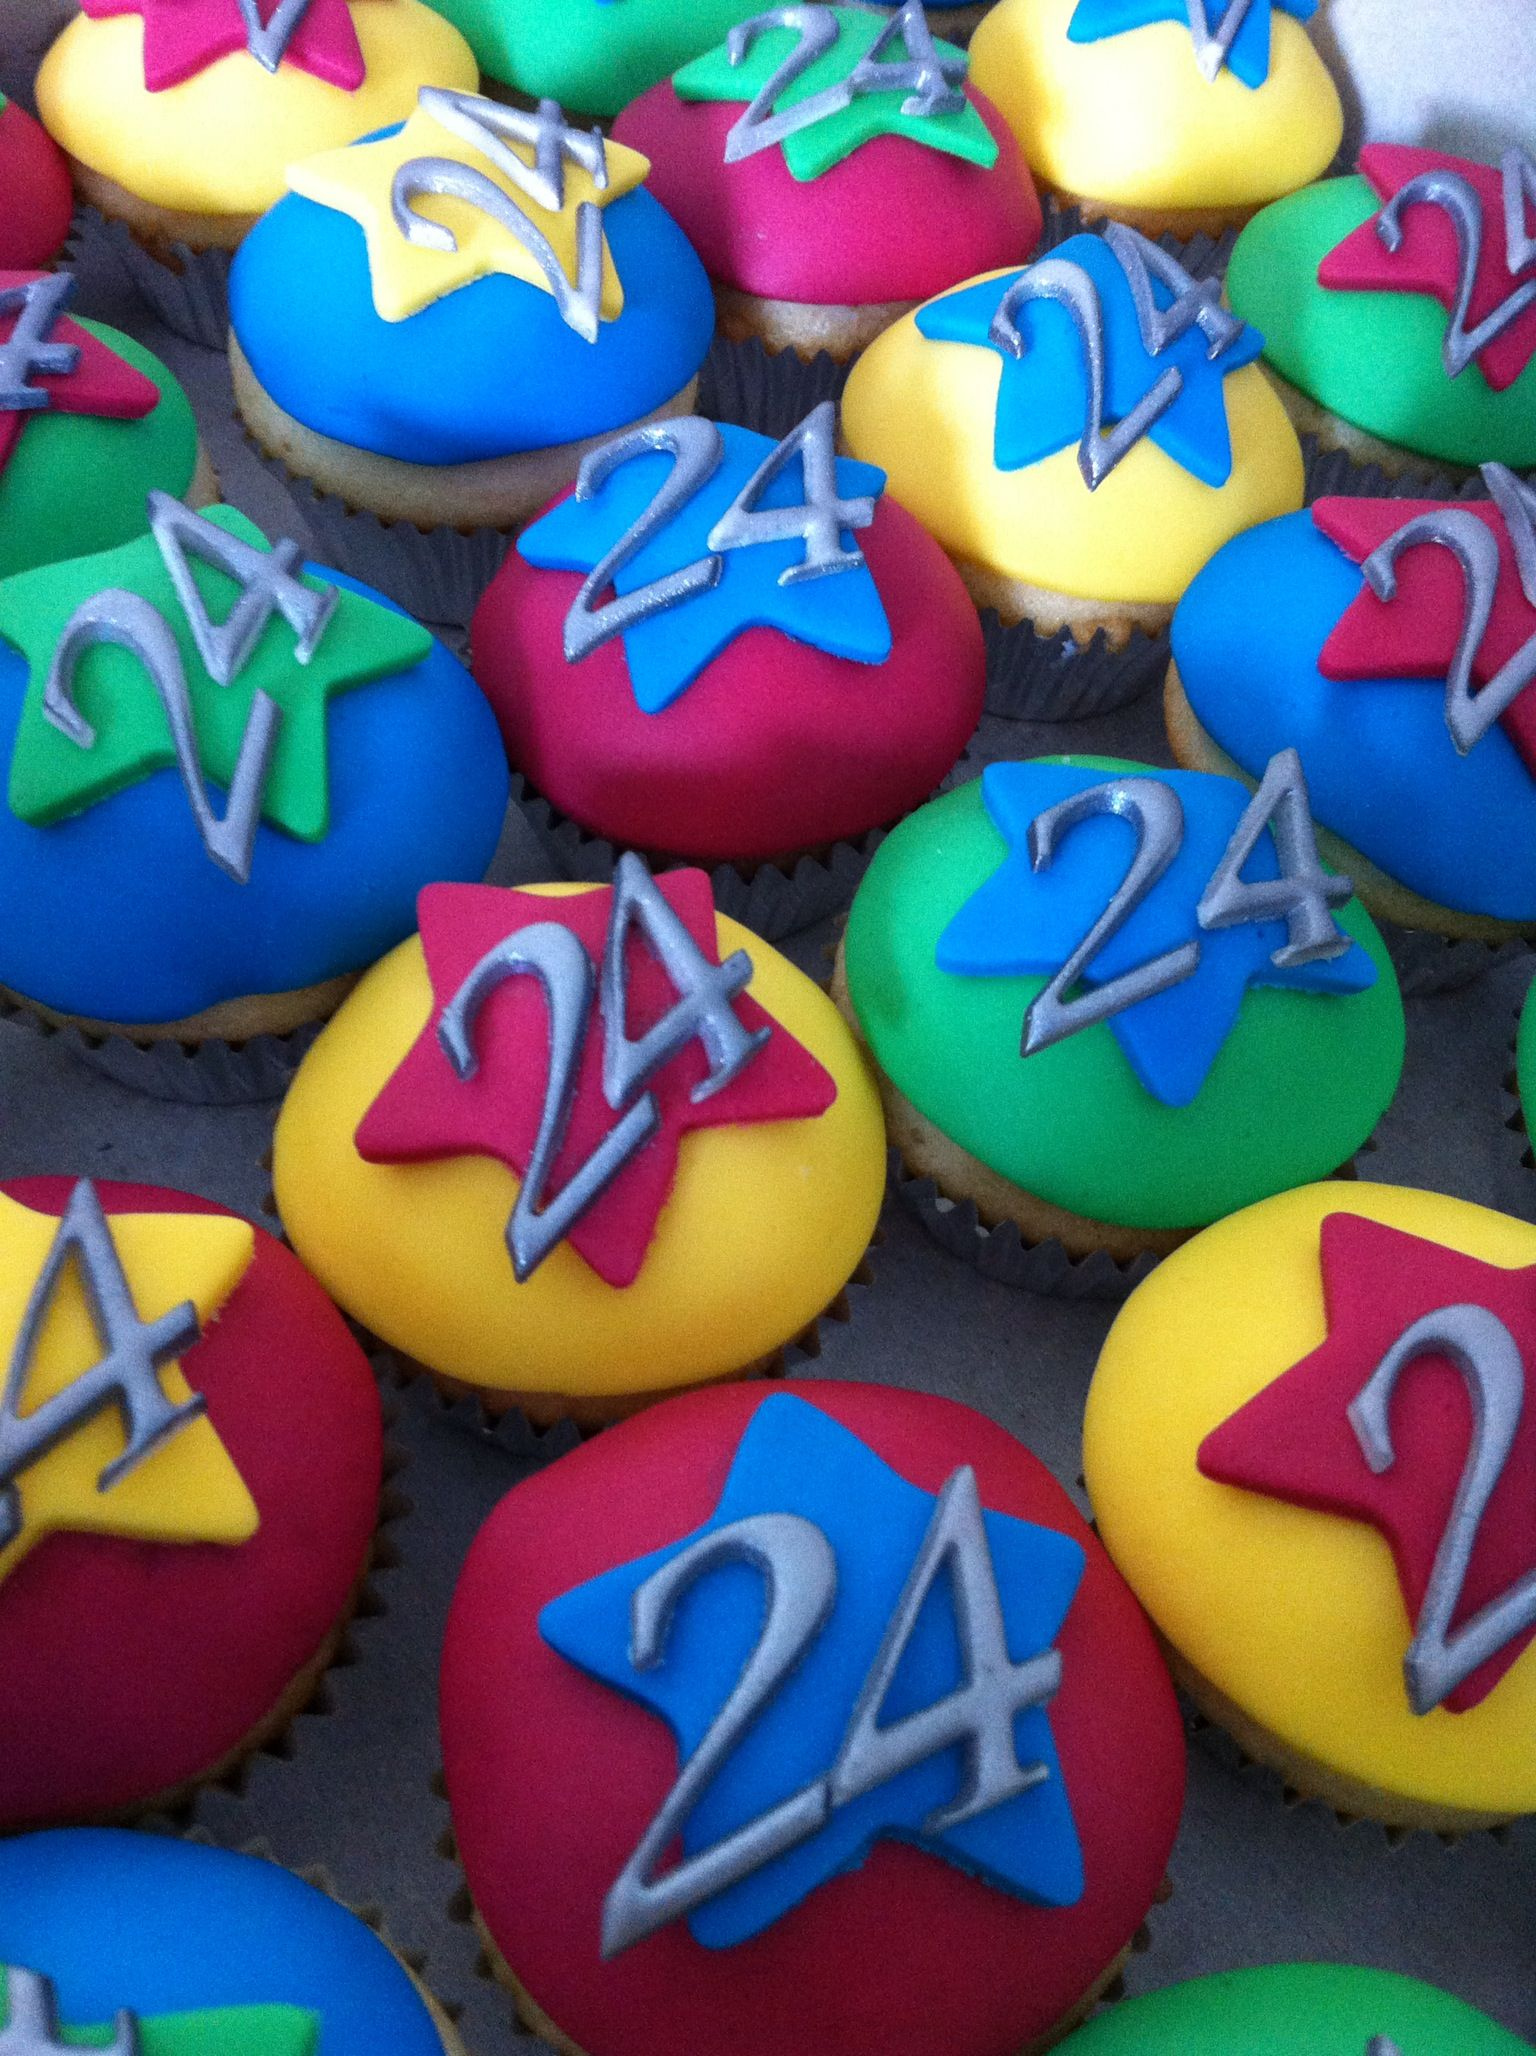 """24"" birthday cakes 24th birthday cake, Cake, Birthday cake"